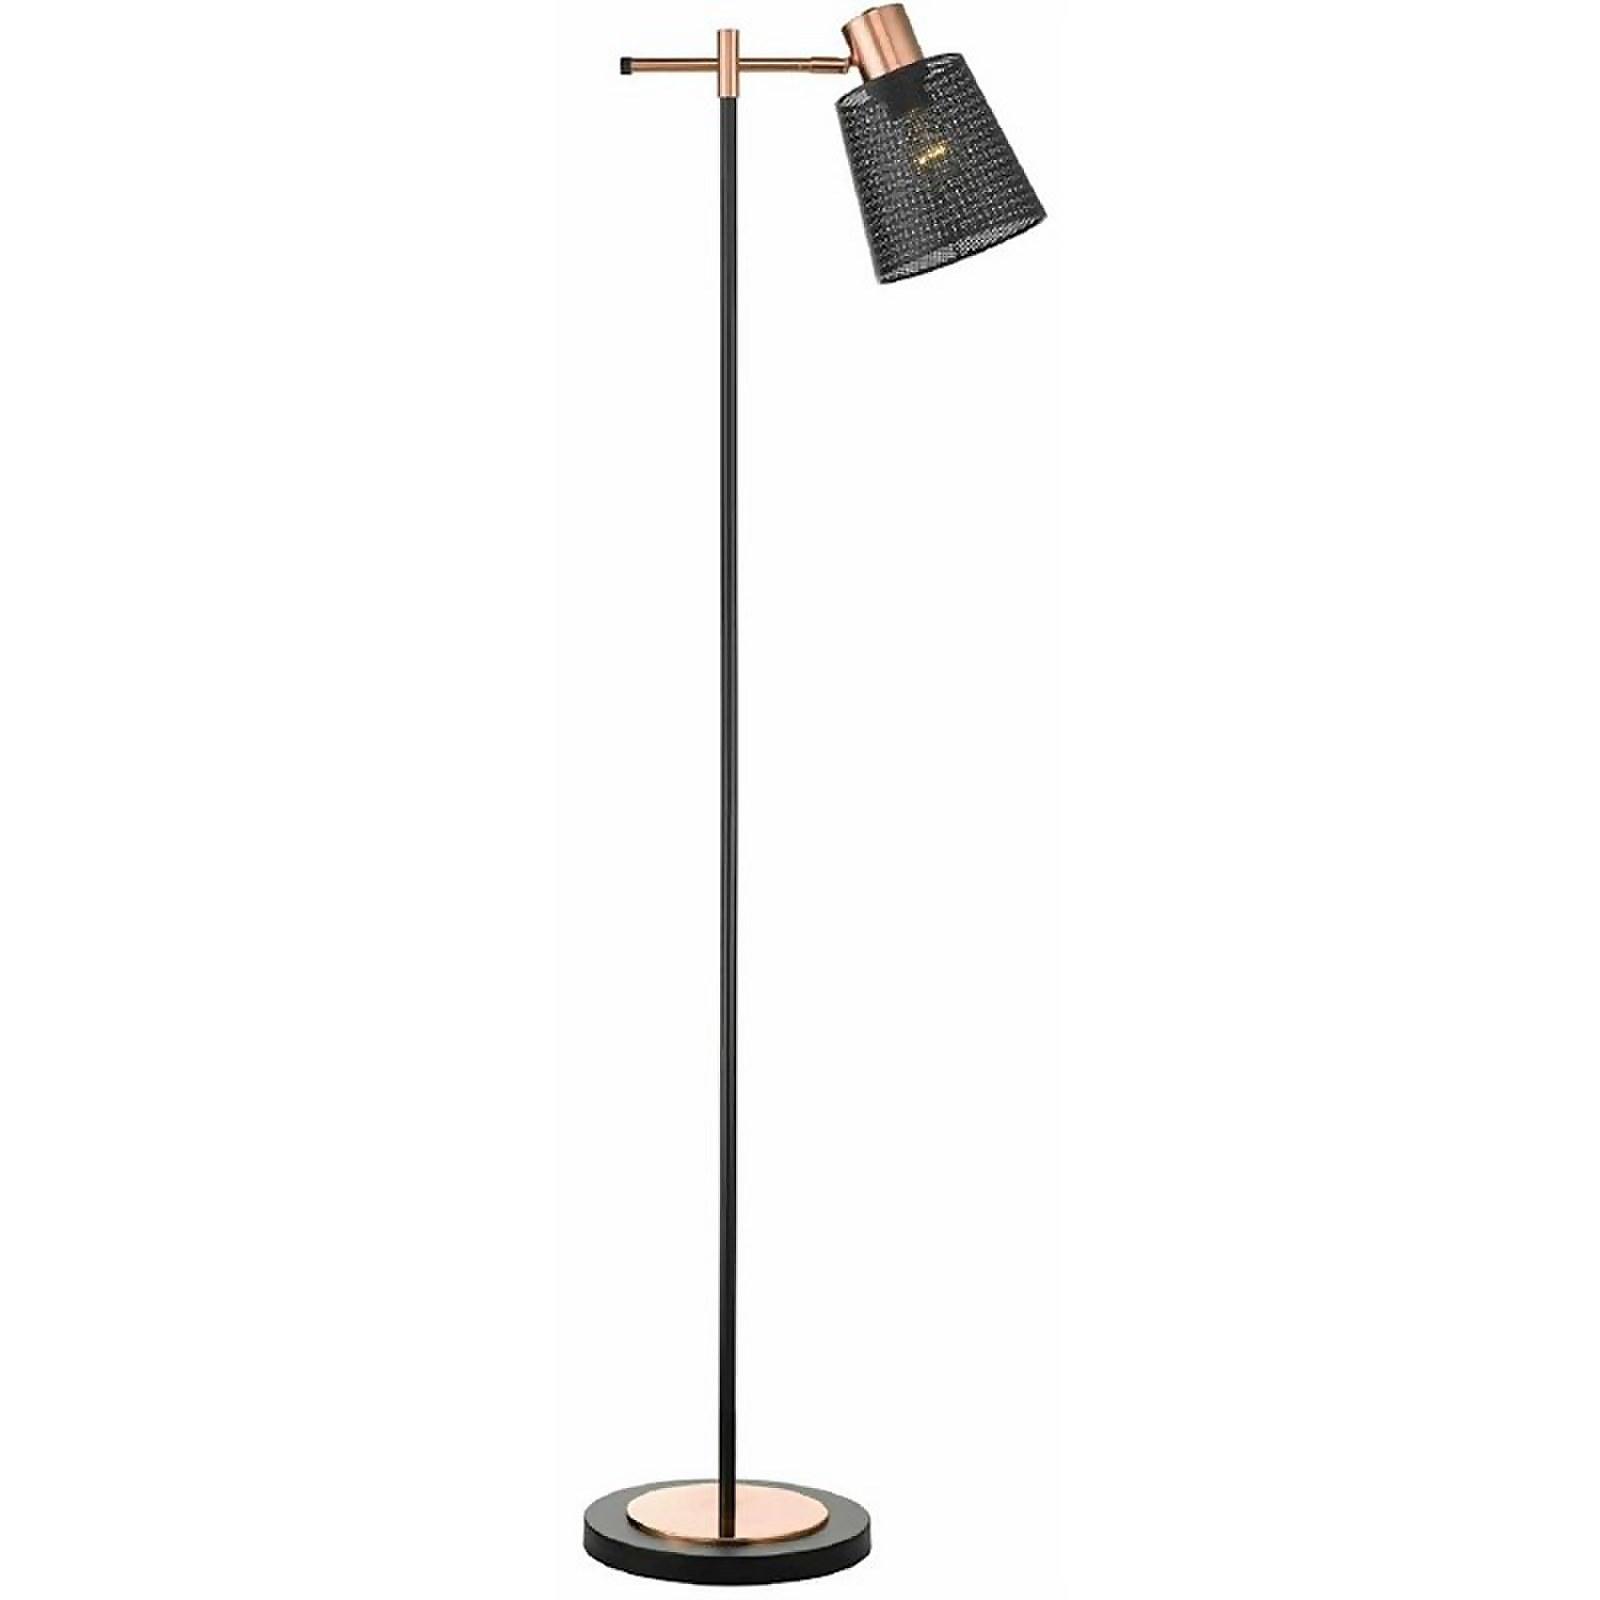 Tintin Floor Lamp - Black